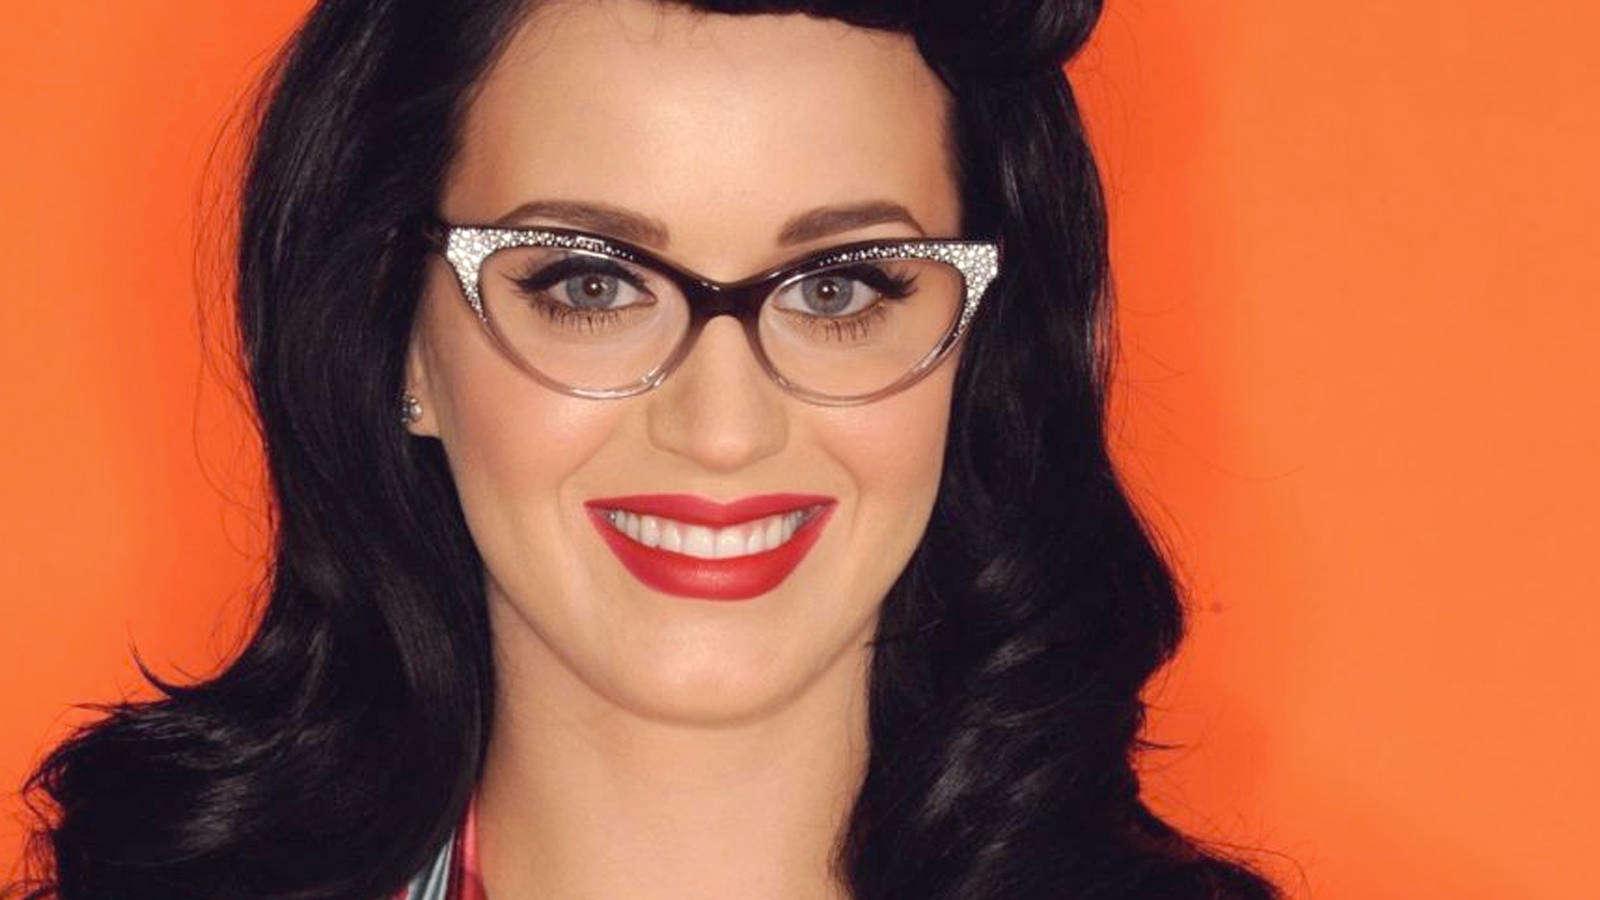 Glasses for grey eyes